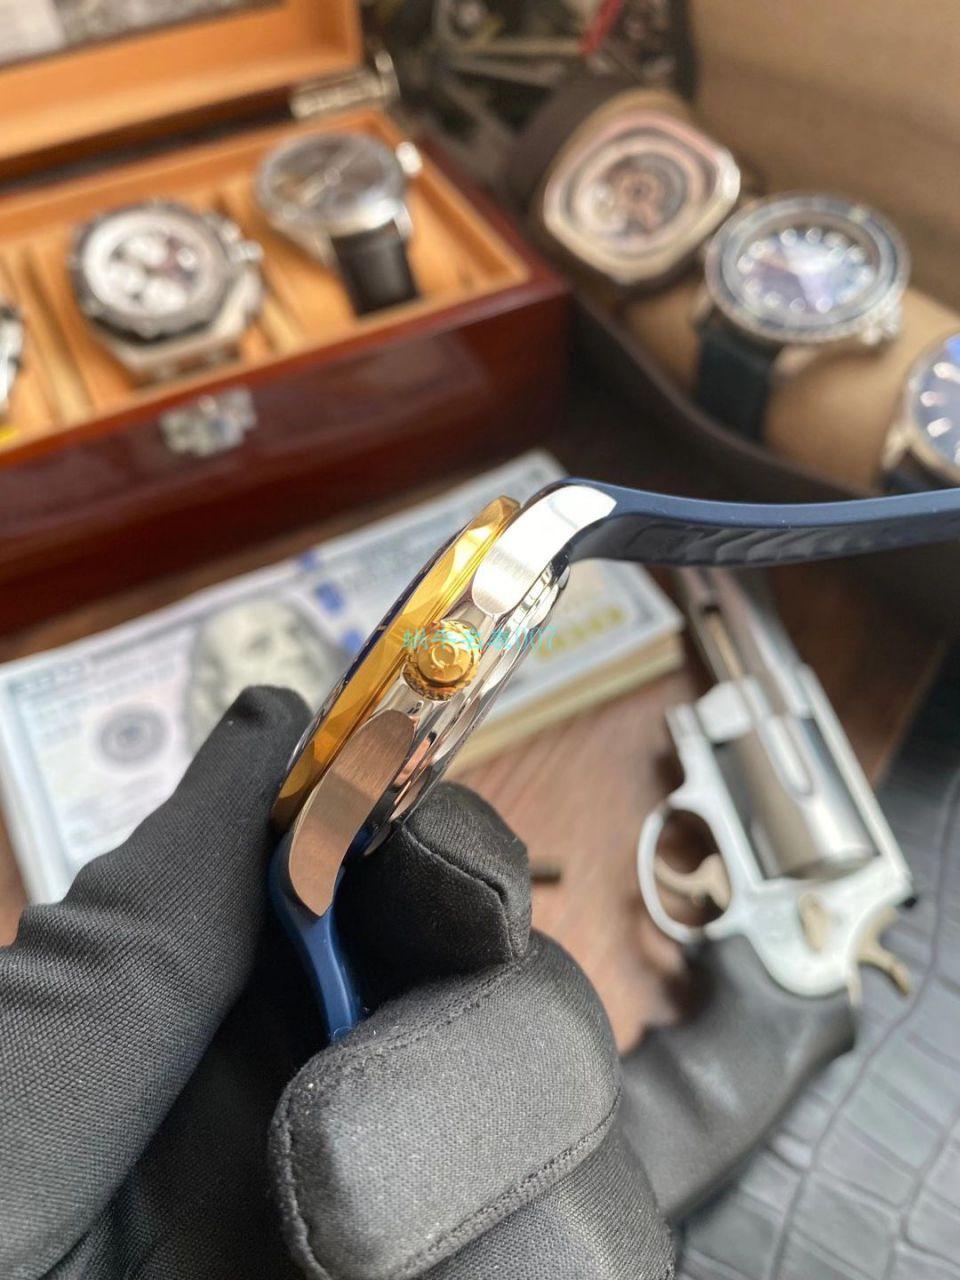 VS厂欧米茄海马300米间黄金蓝盘1比1超A复刻手表210.22.42.20.03.001腕表 / VS781